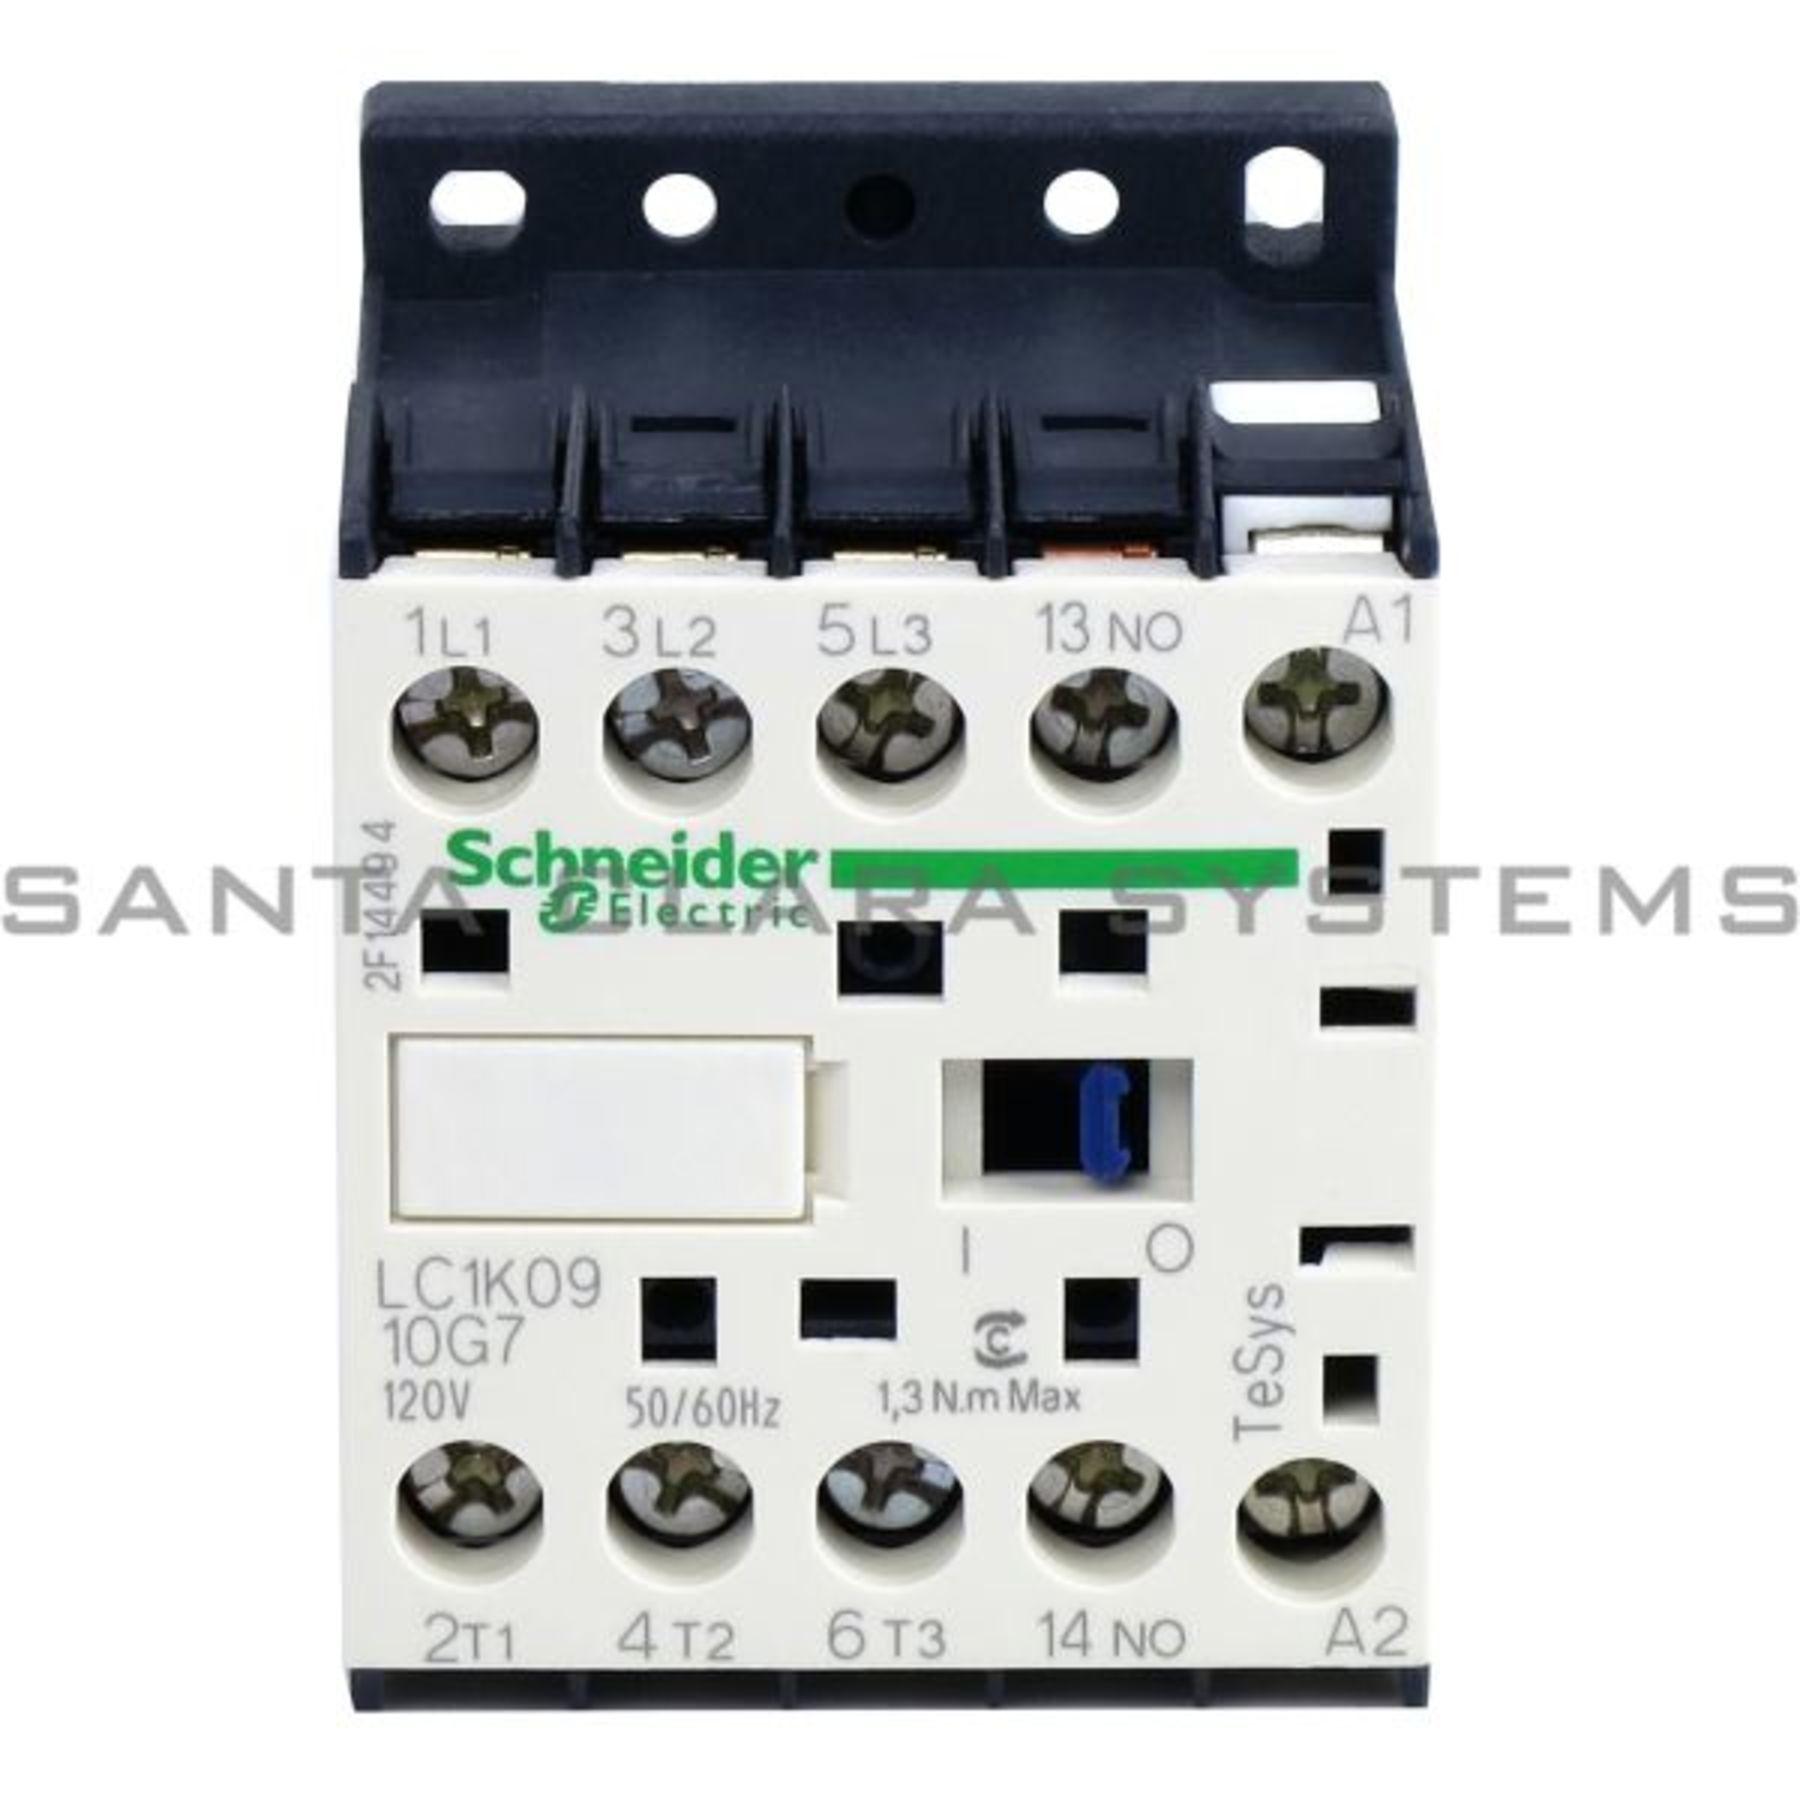 LC1K0910G7 TeSys K contactor - 3P - AC-3 <= 440 V 9 A - 1 NO